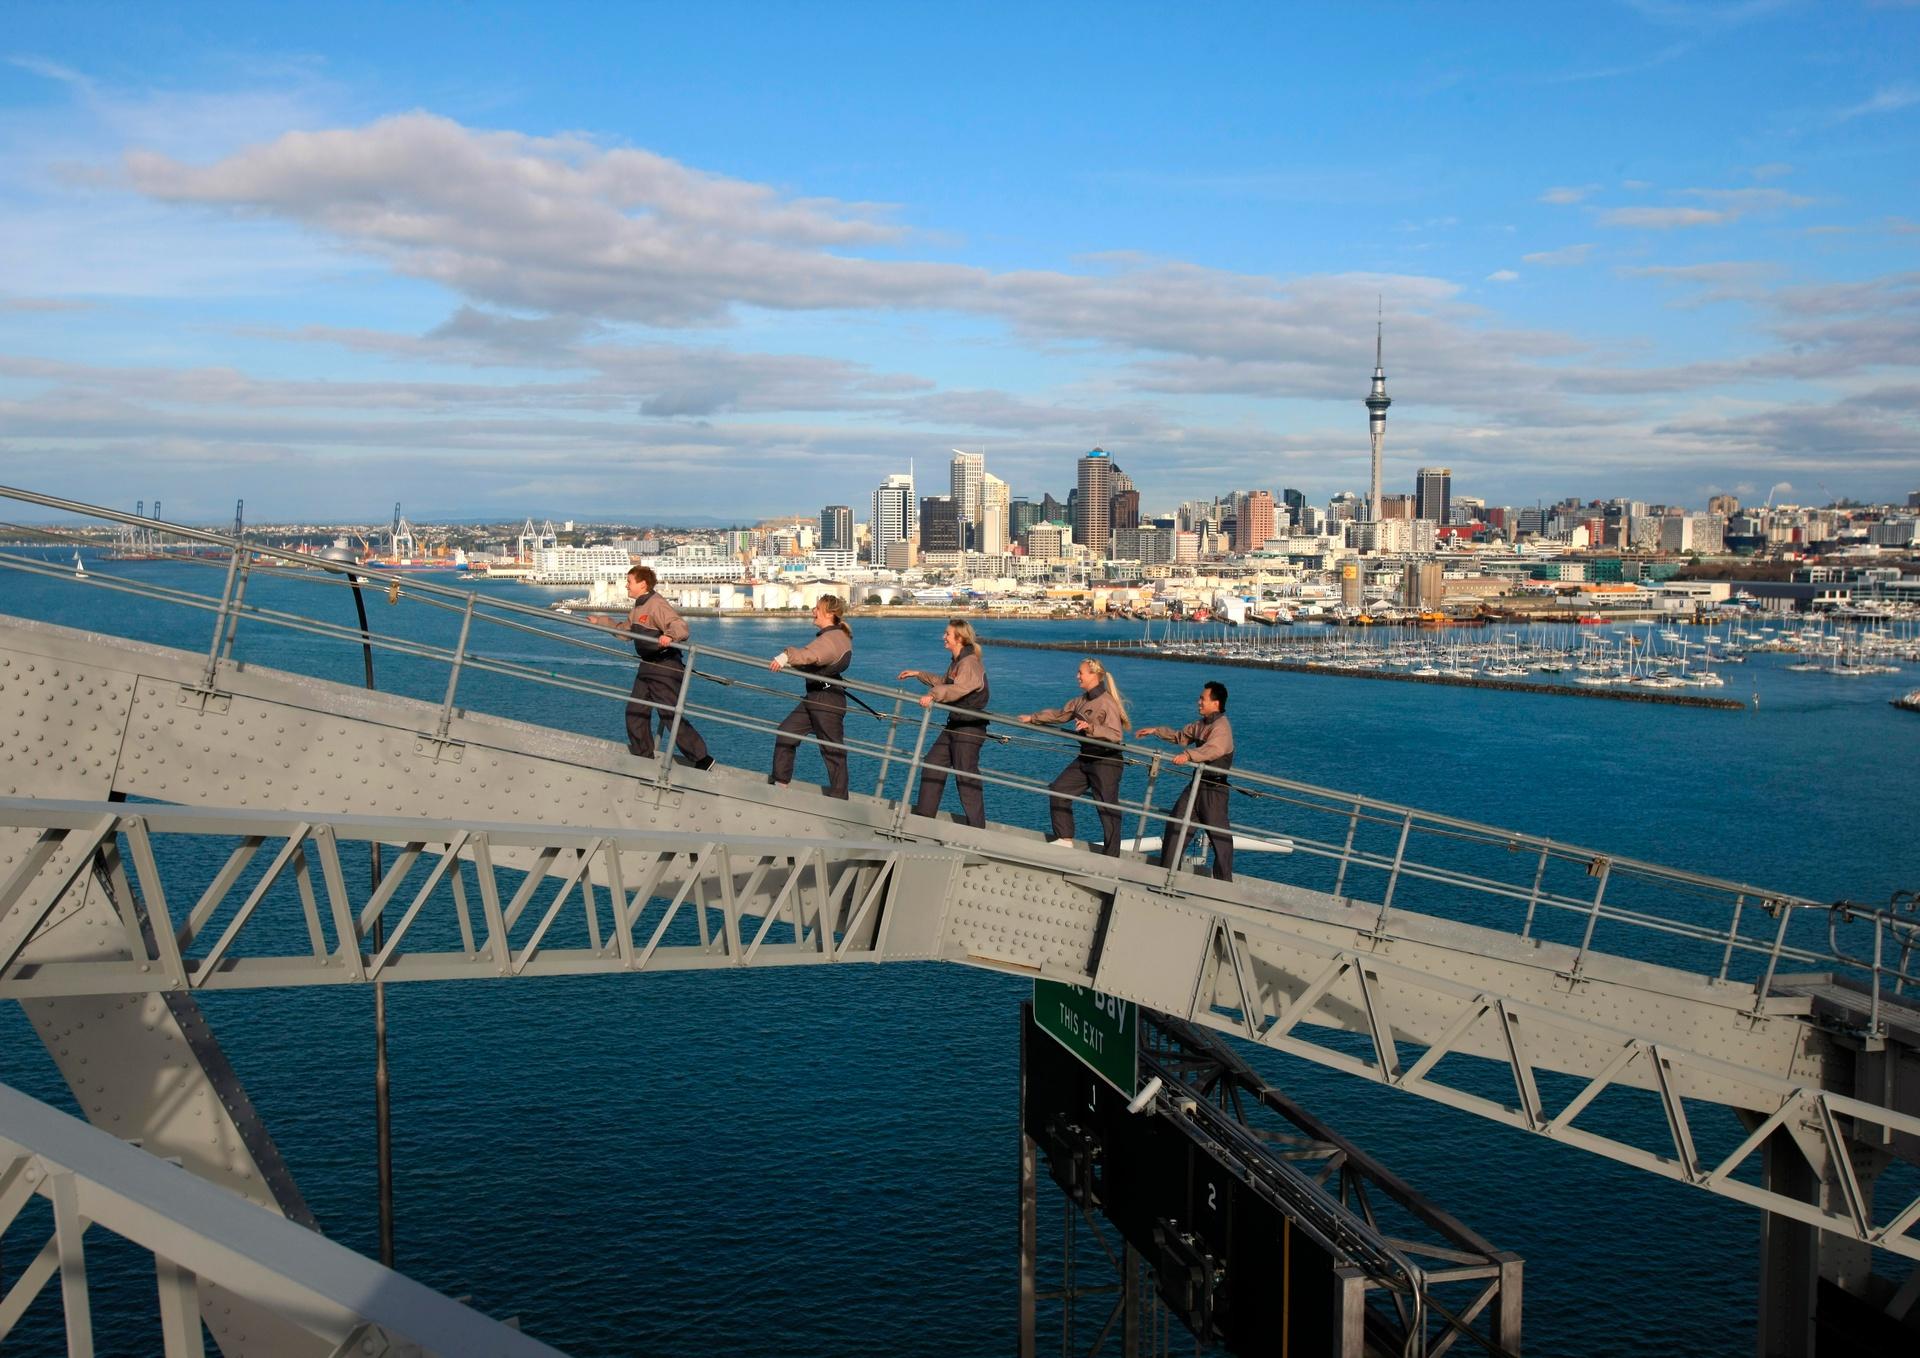 AD302-Auckland-Harbour-Bridge-Auckland-A-J-Hackett-Bungy-New-Zealand.jpg